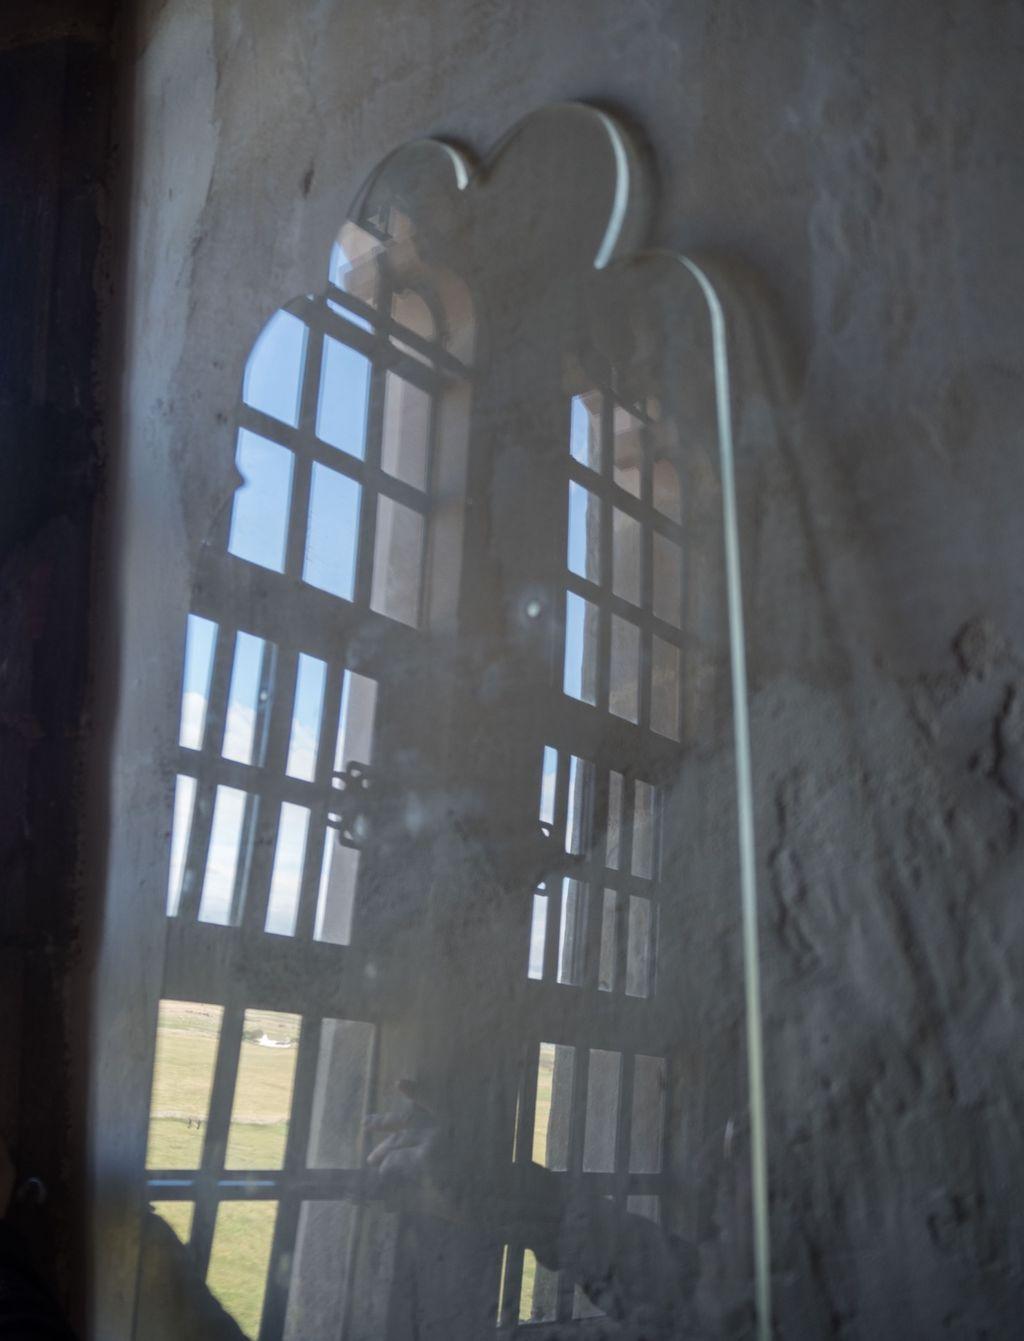 2031 - lindisfarne castle